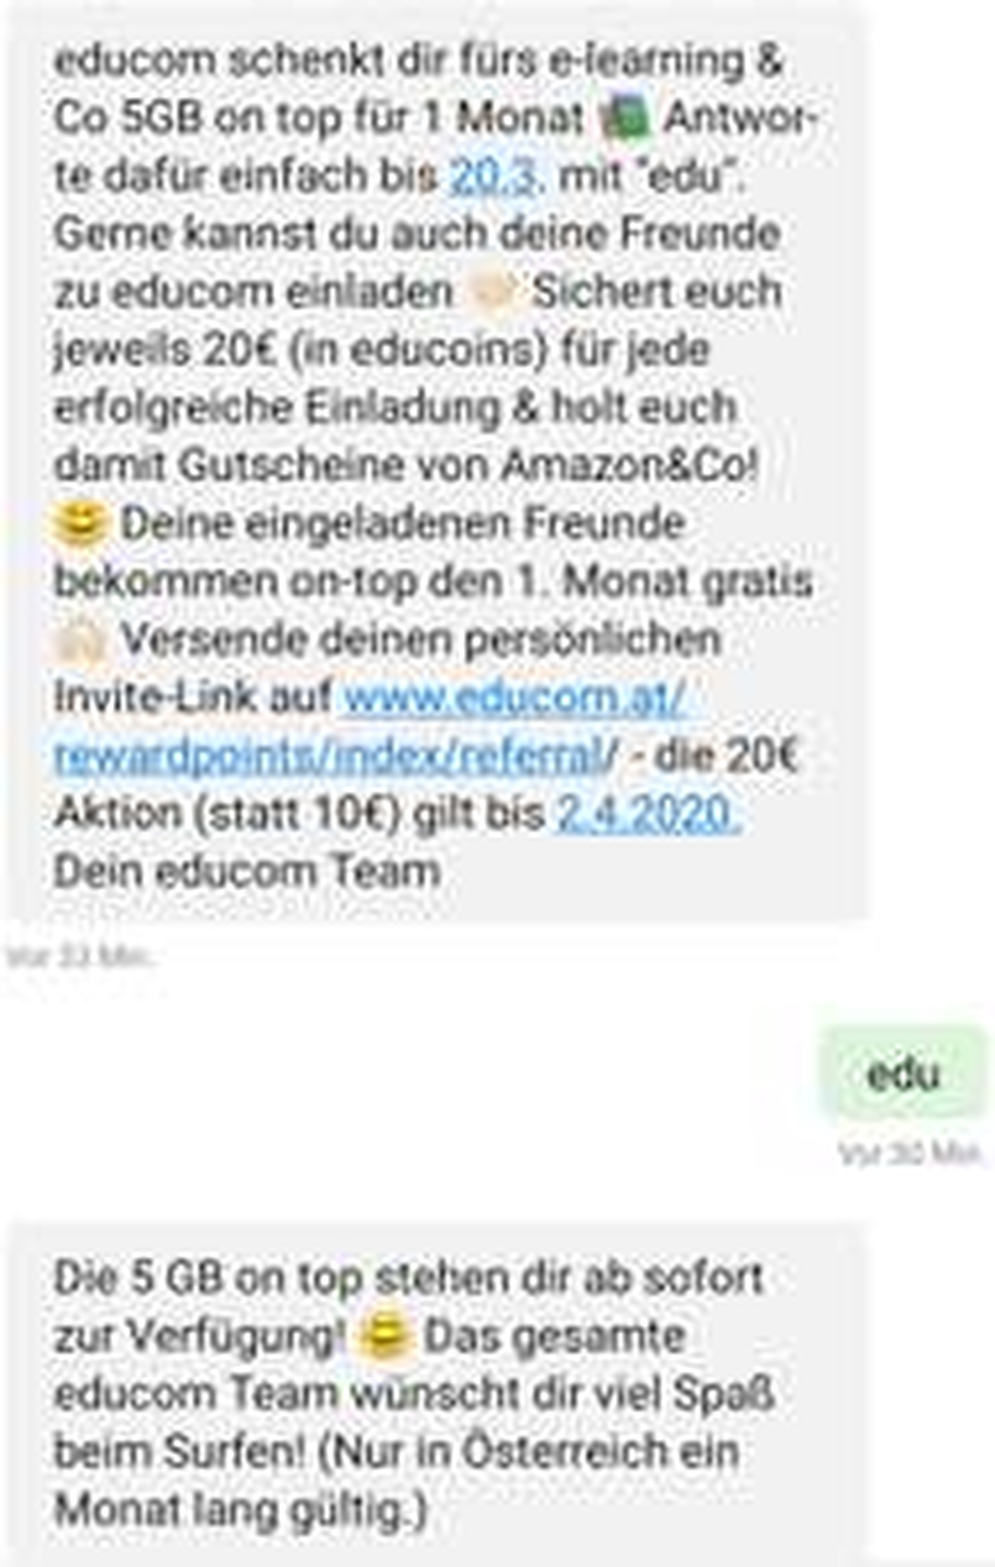 [educom-Handy] | 5 GB Daten onTop